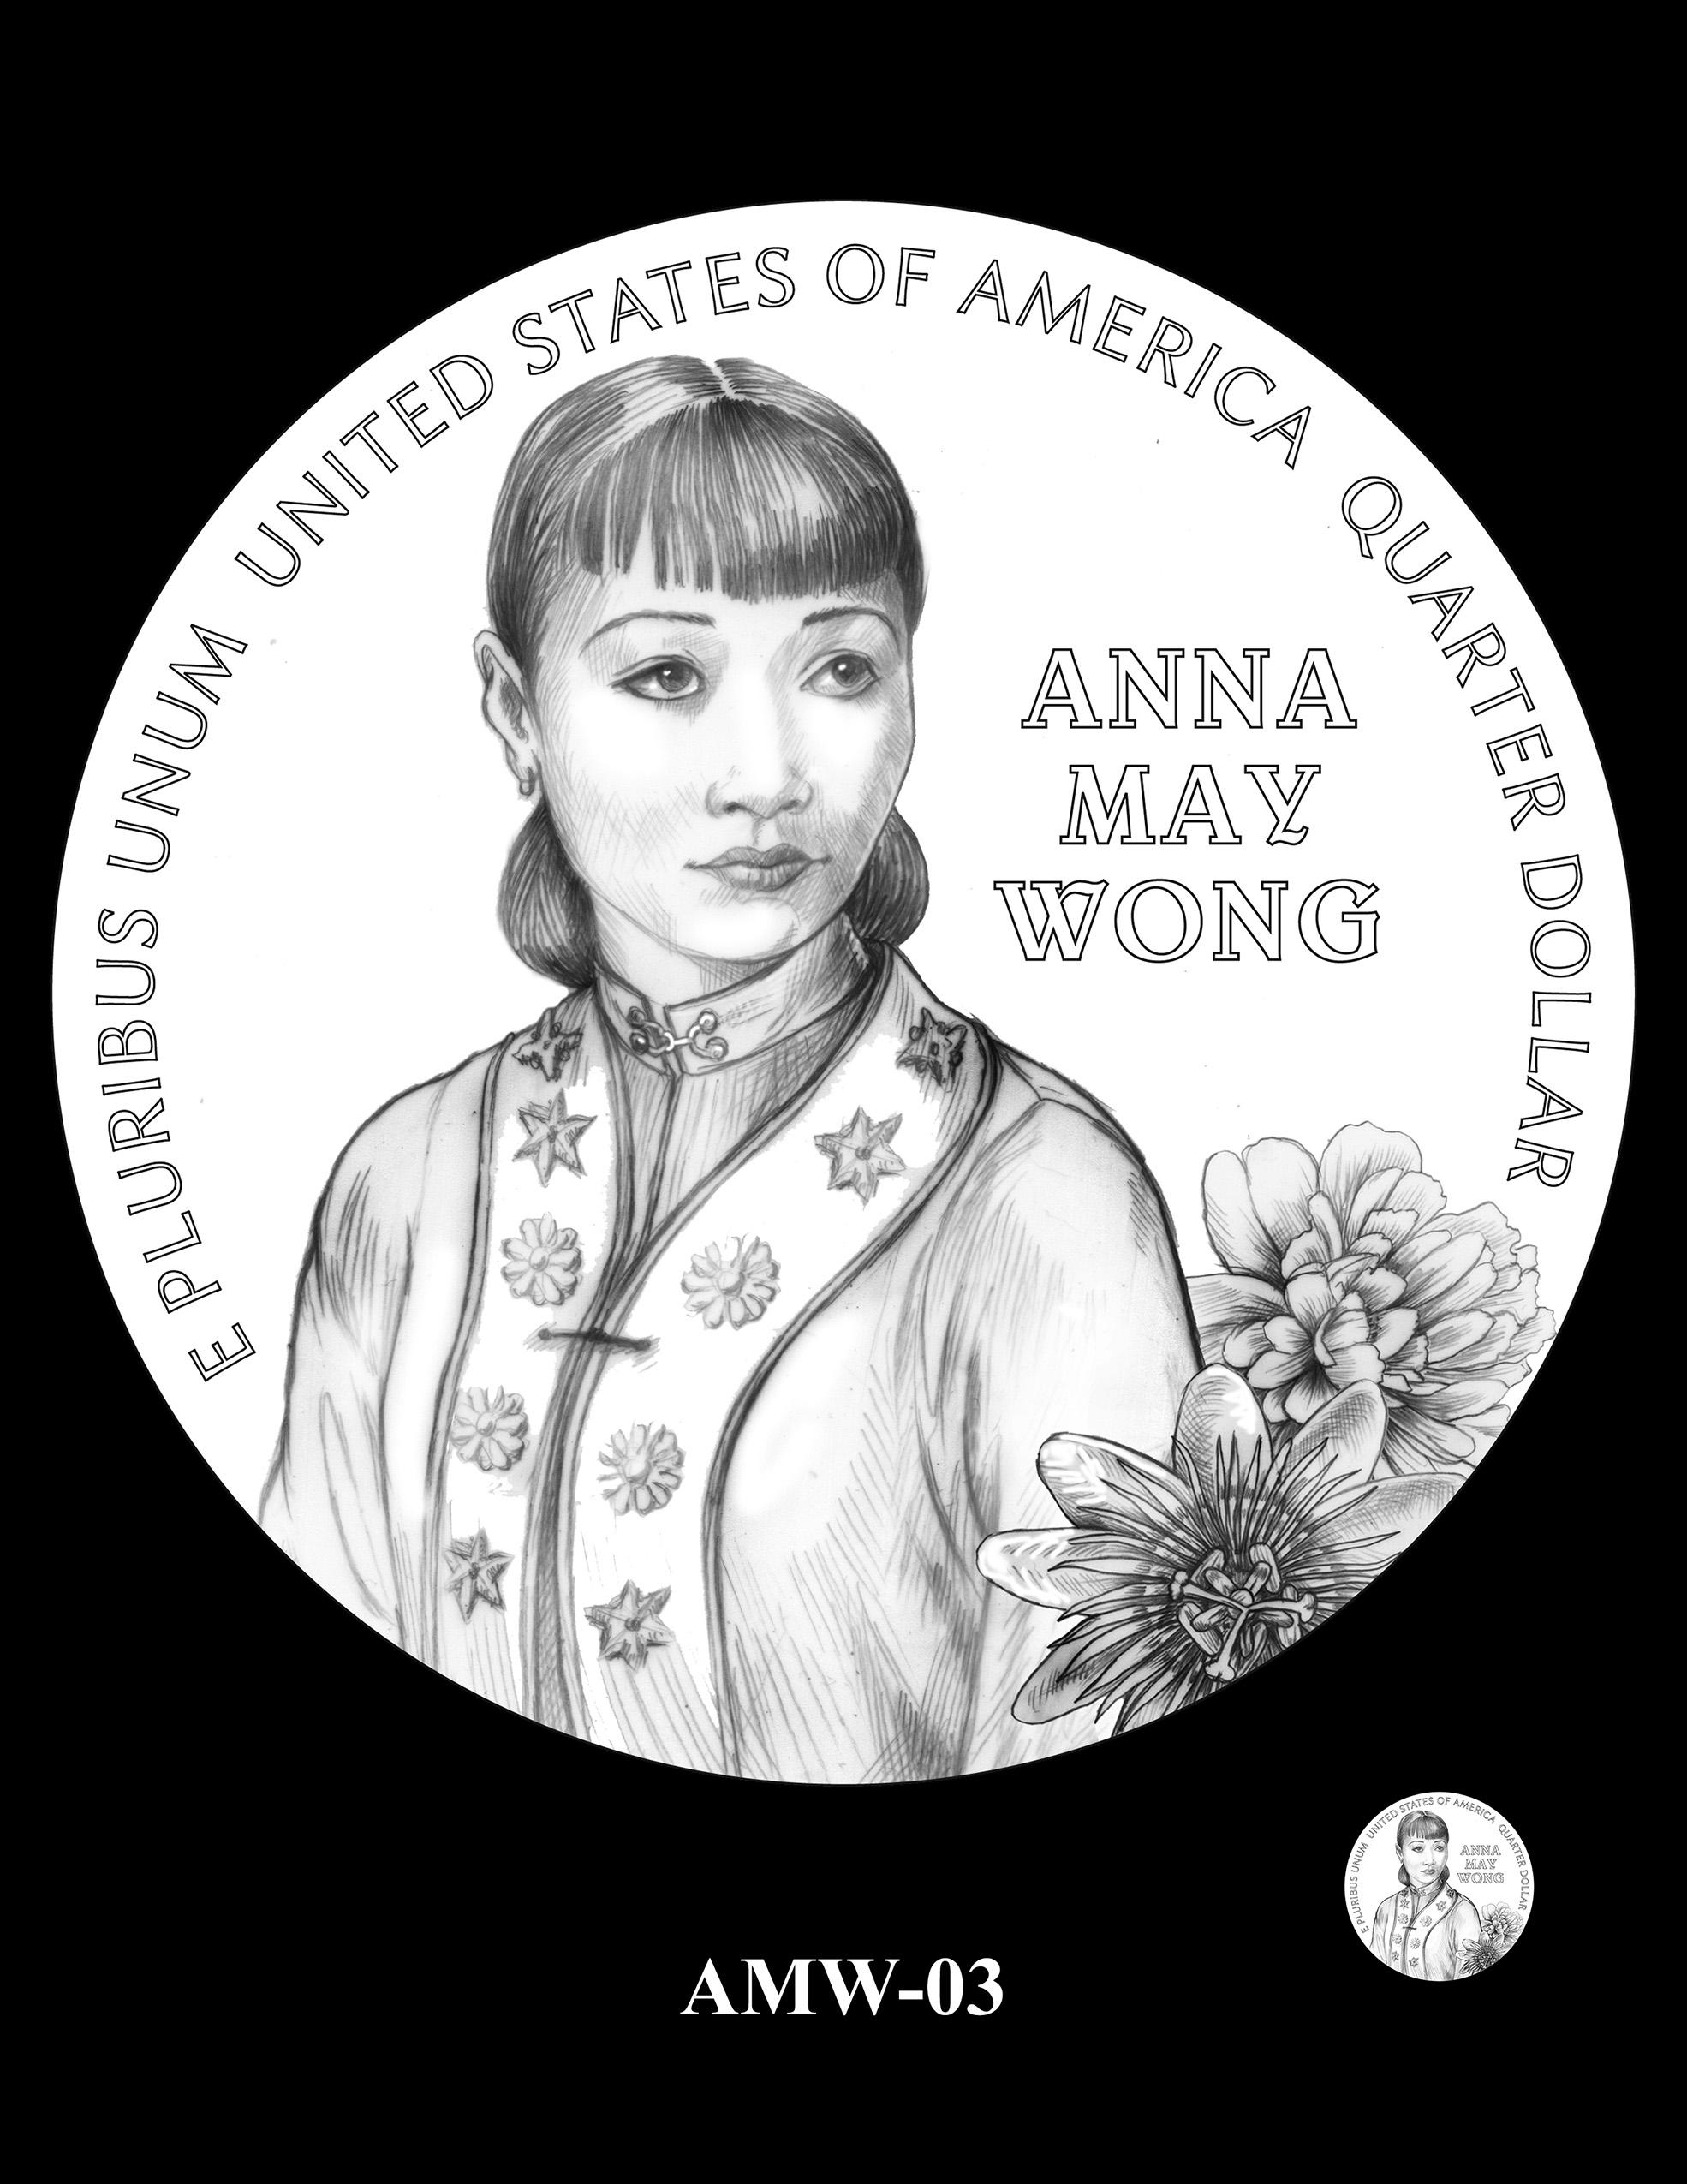 AMW-03 -- 2022 American Women Quarters - Anna May Wong